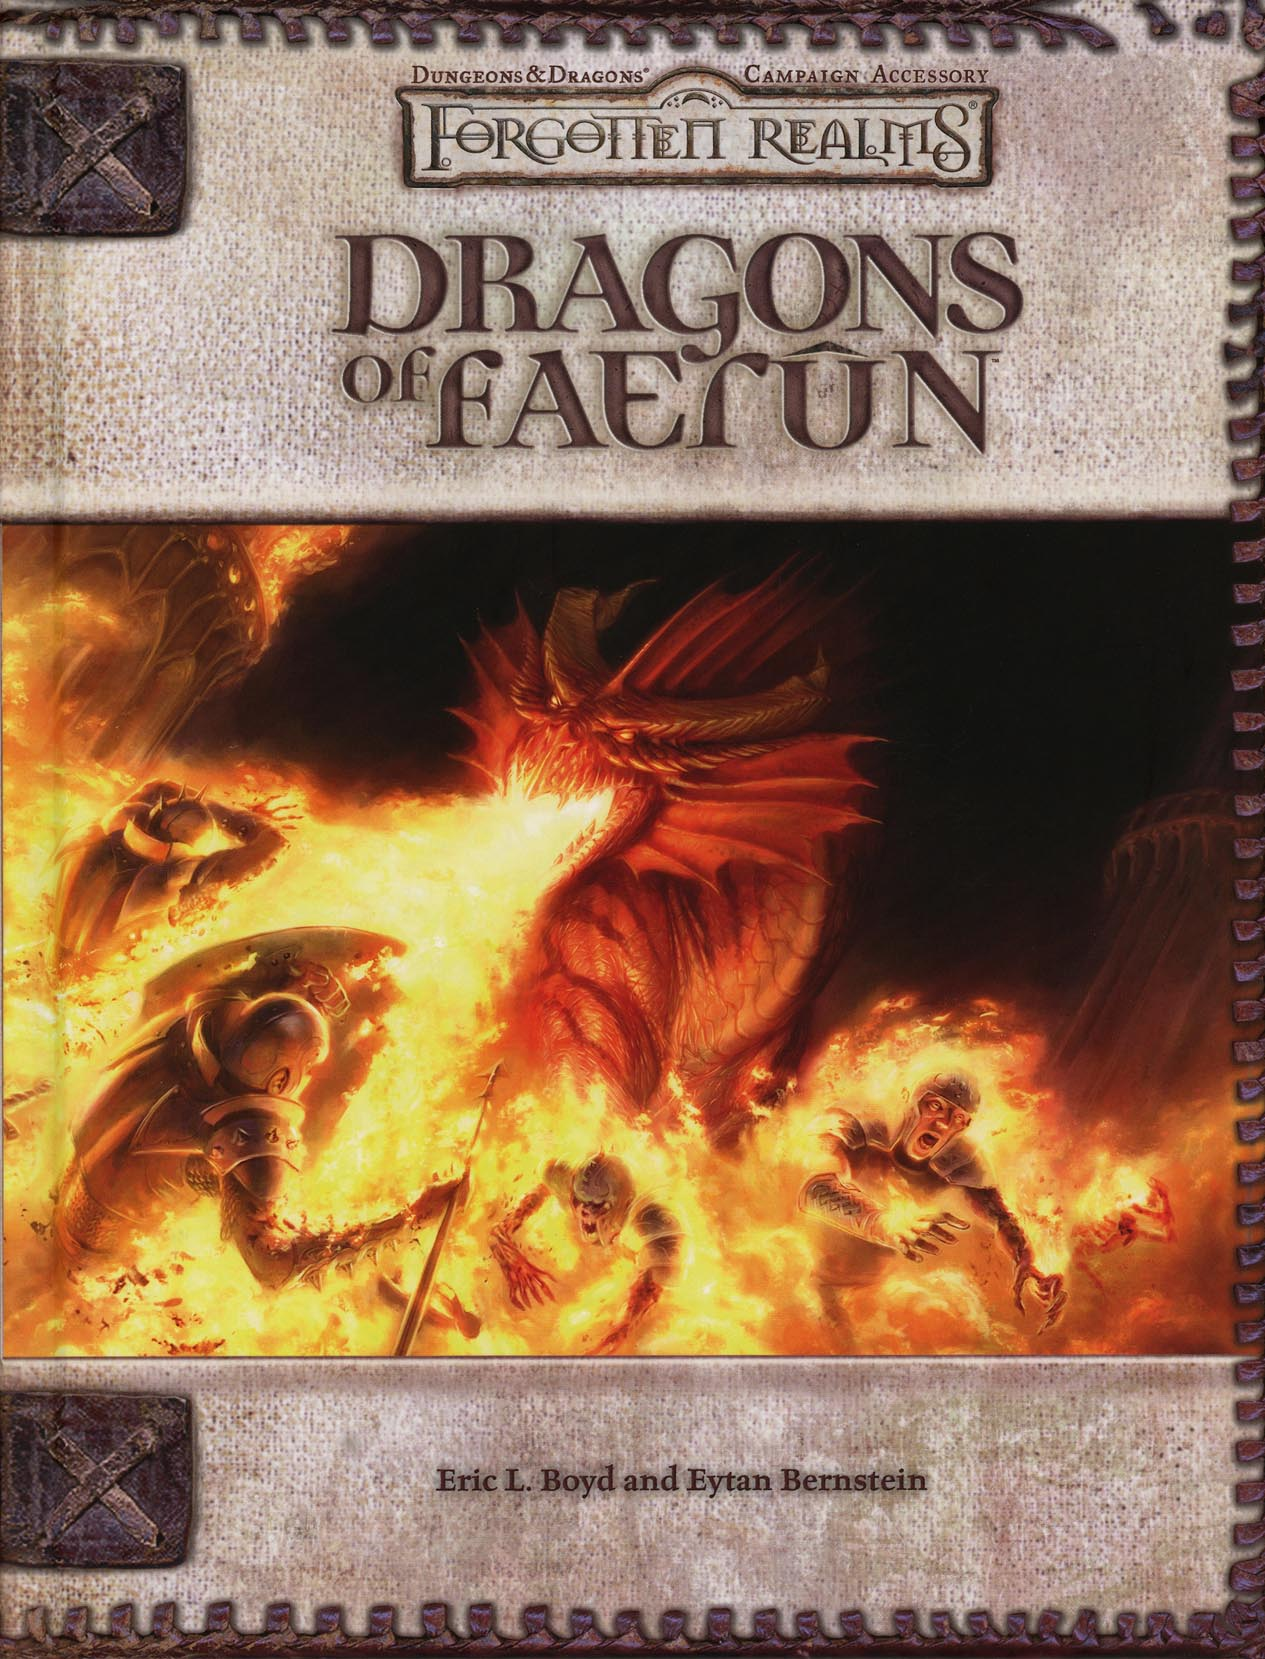 Dragons of Faerûn